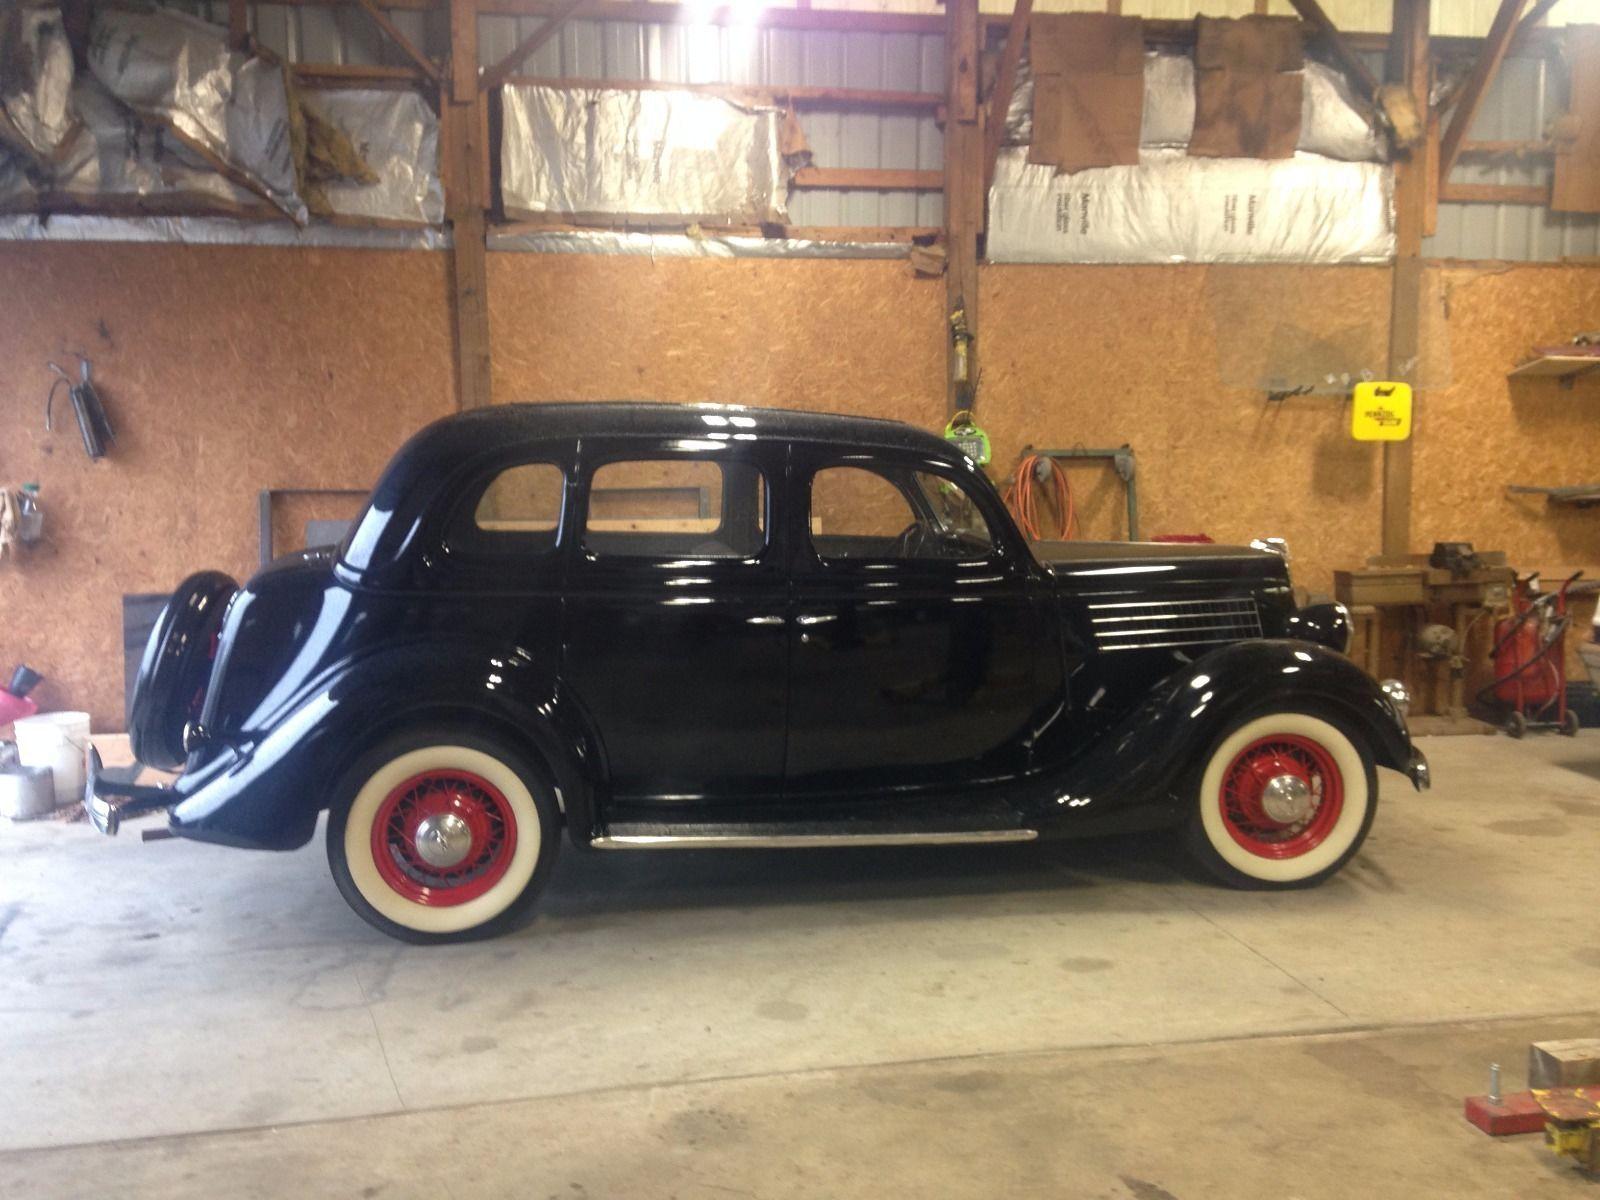 1935 Ford F48 Humpback Sedan   Pre-war cars for sale   Pinterest ...